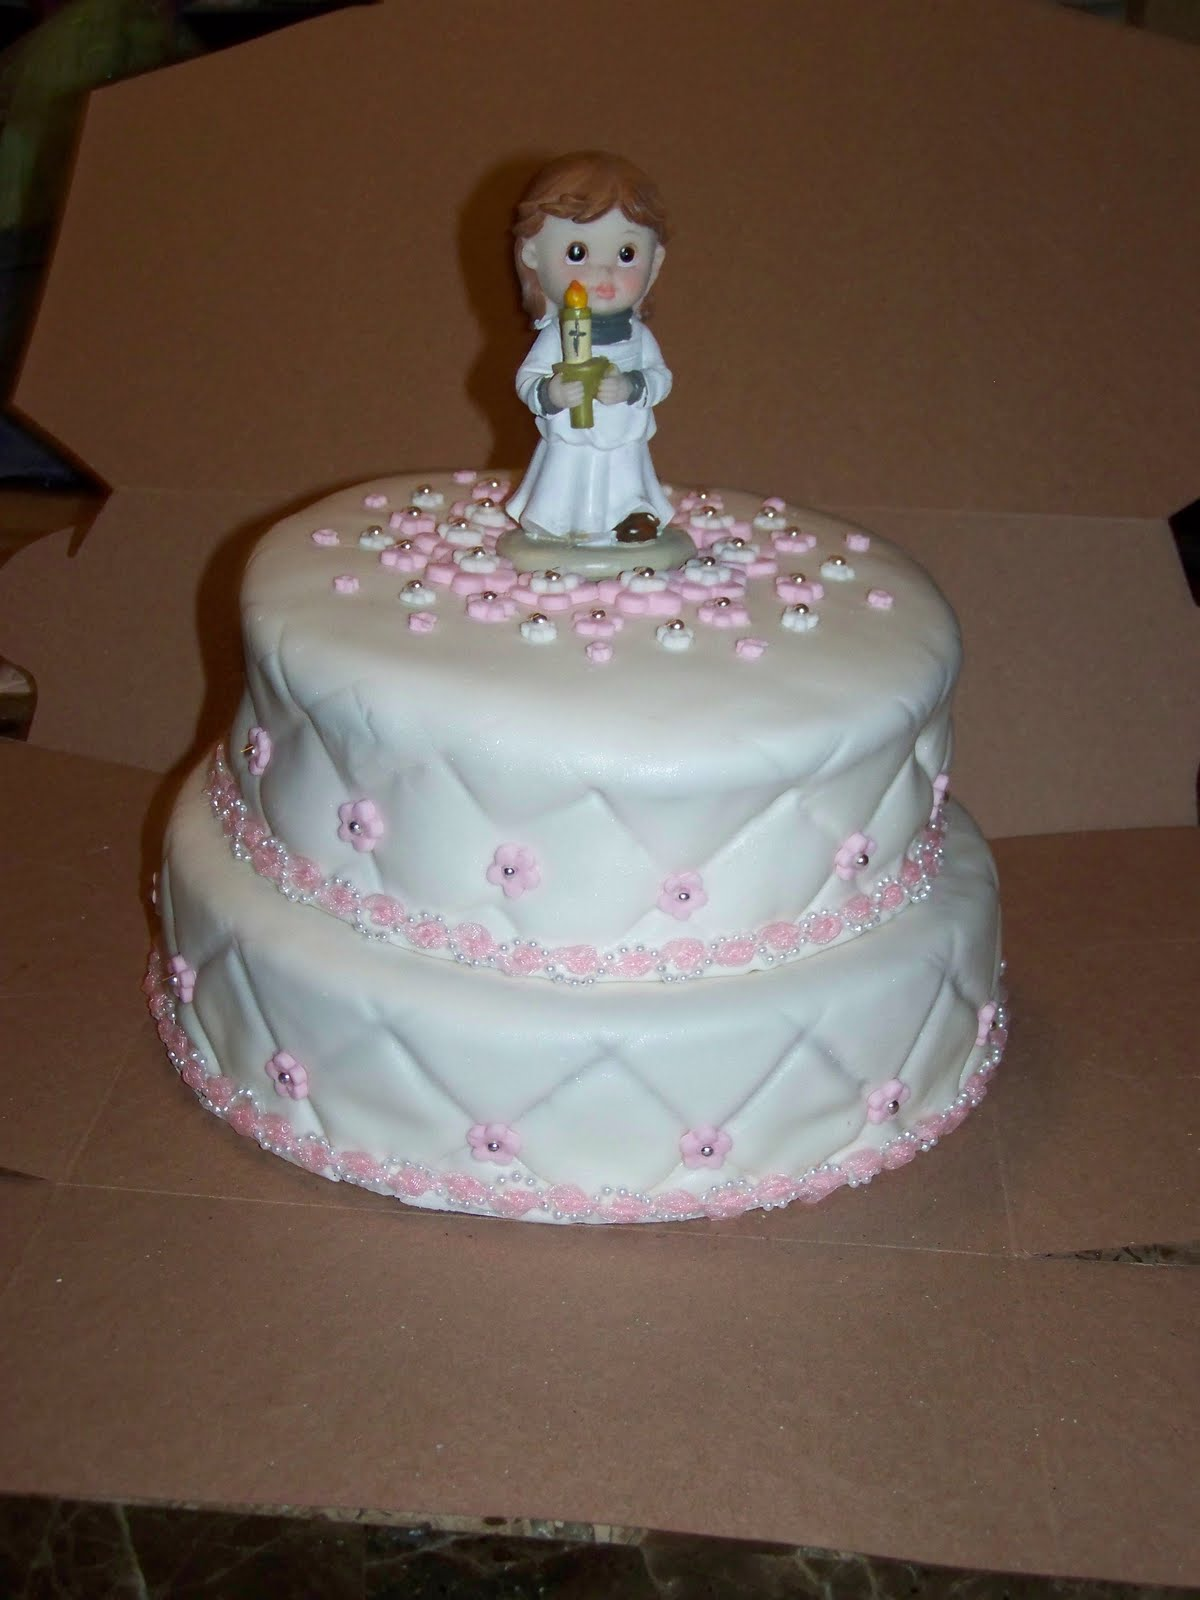 Cake-A-Licious: First Communion Cake